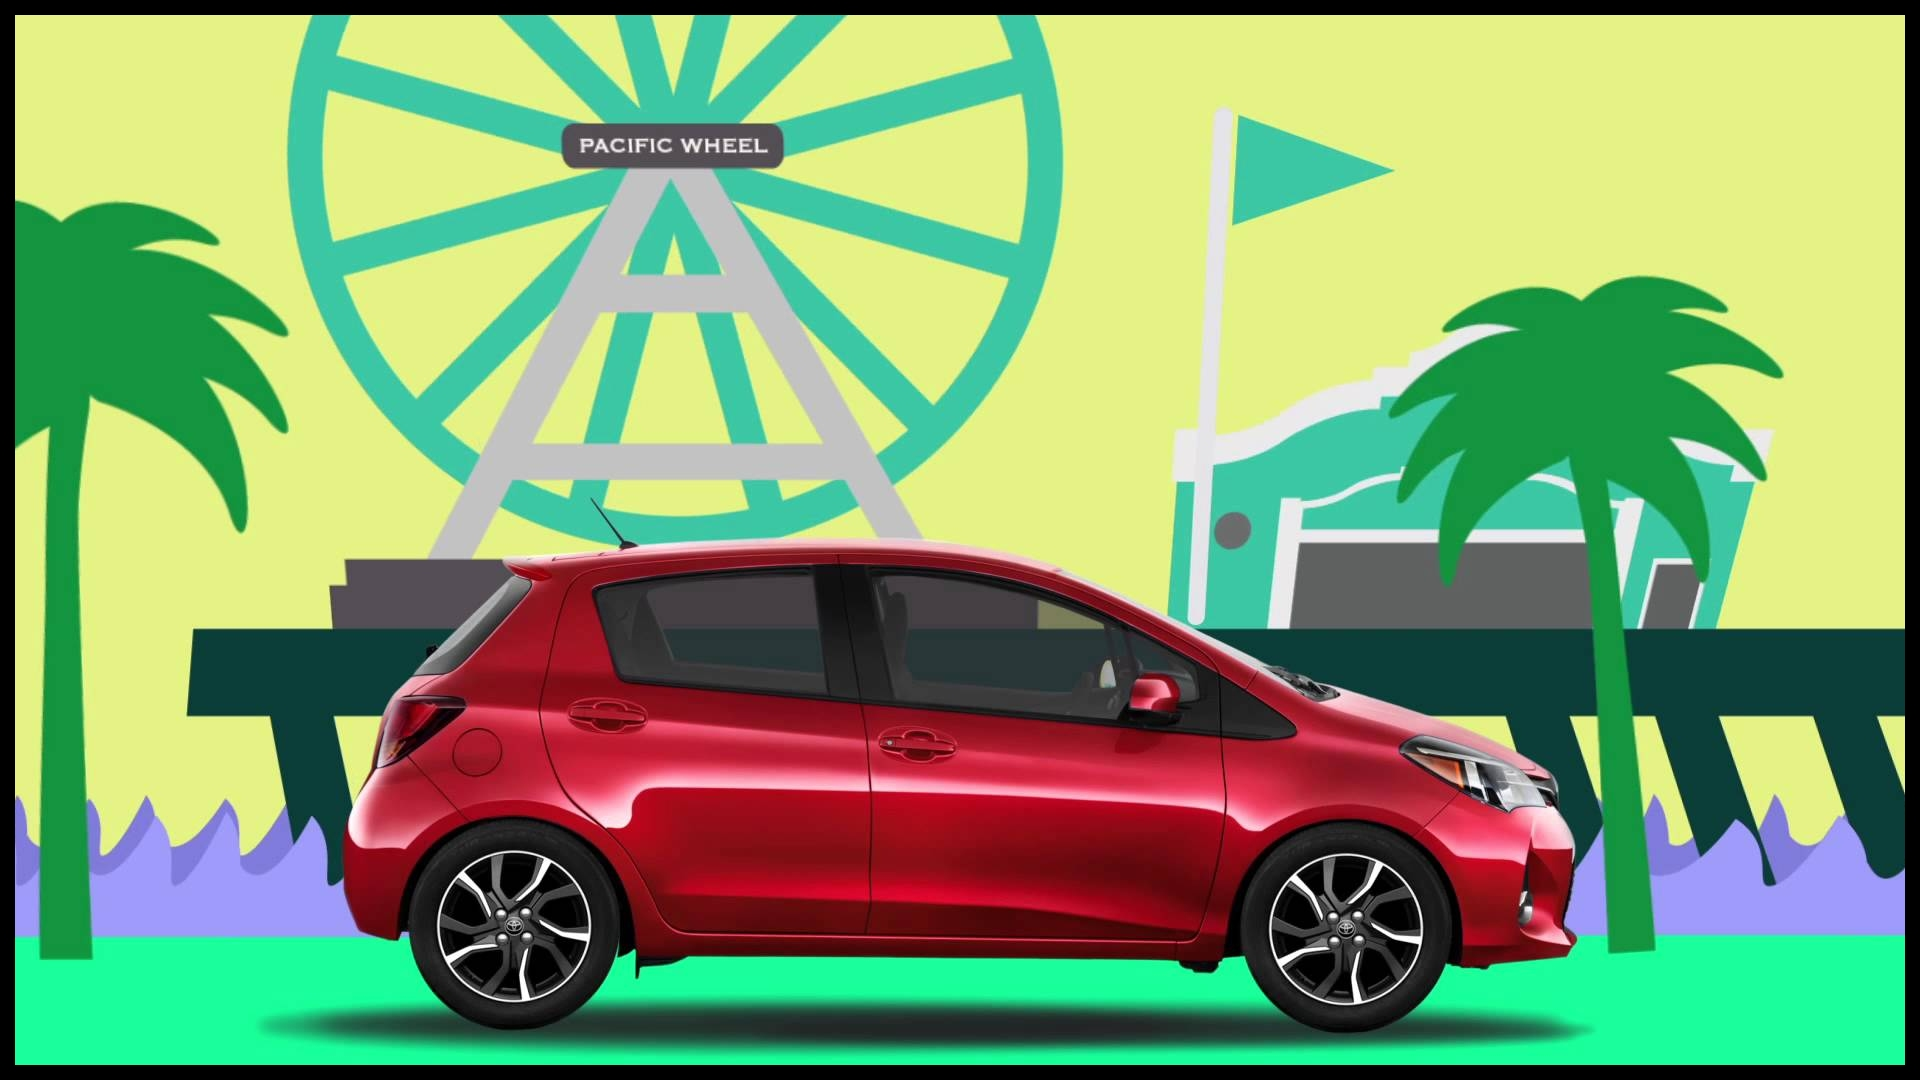 Animated Toyota Yaris mercial